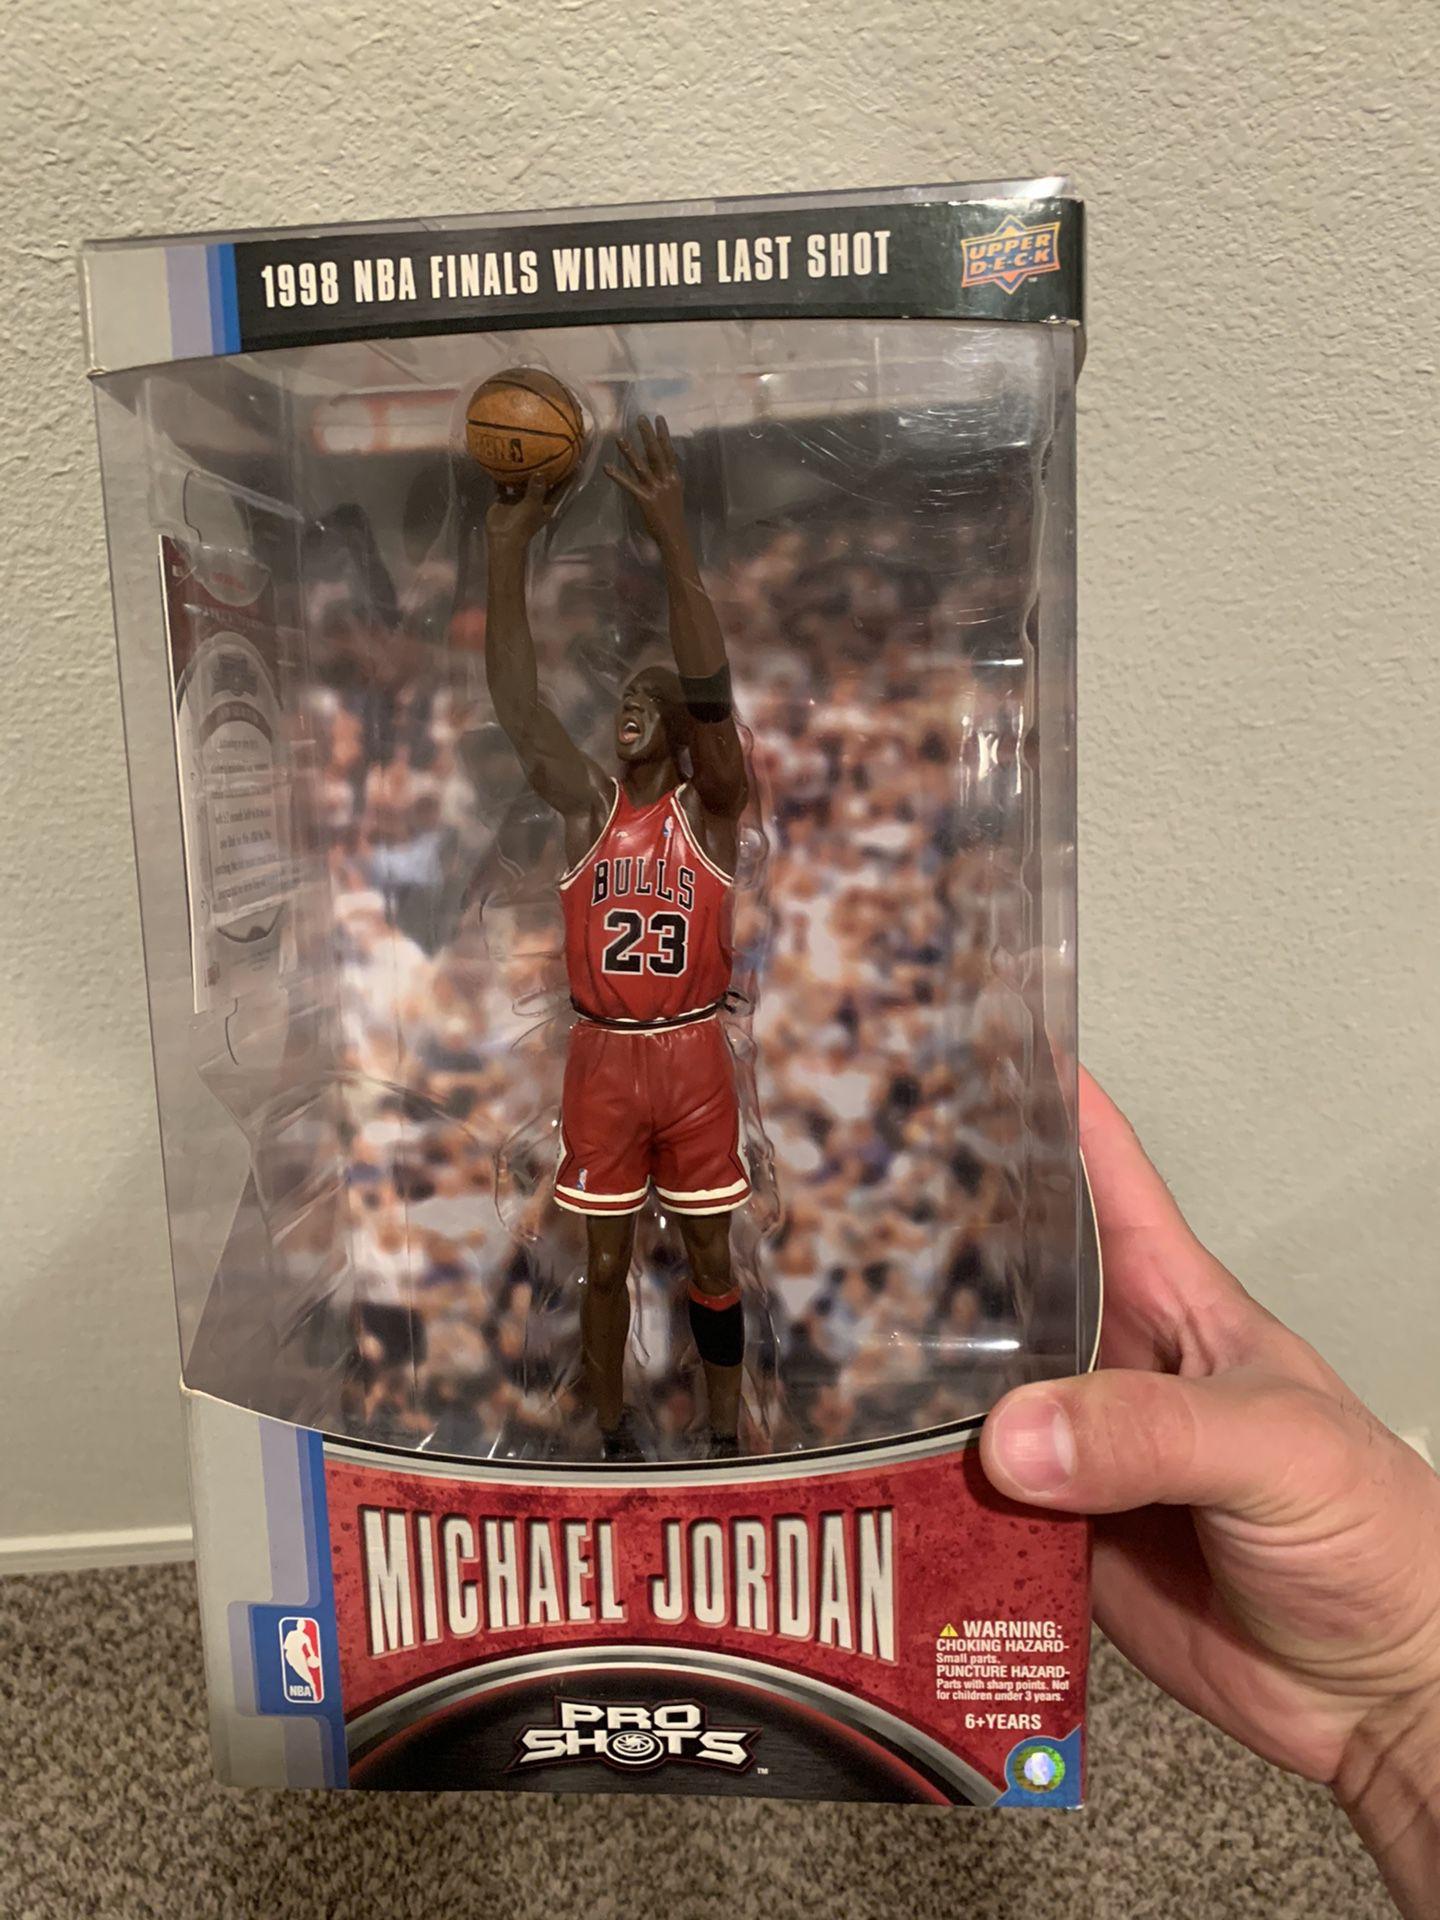 750$ Michael Jordan Last shot ProShots figure